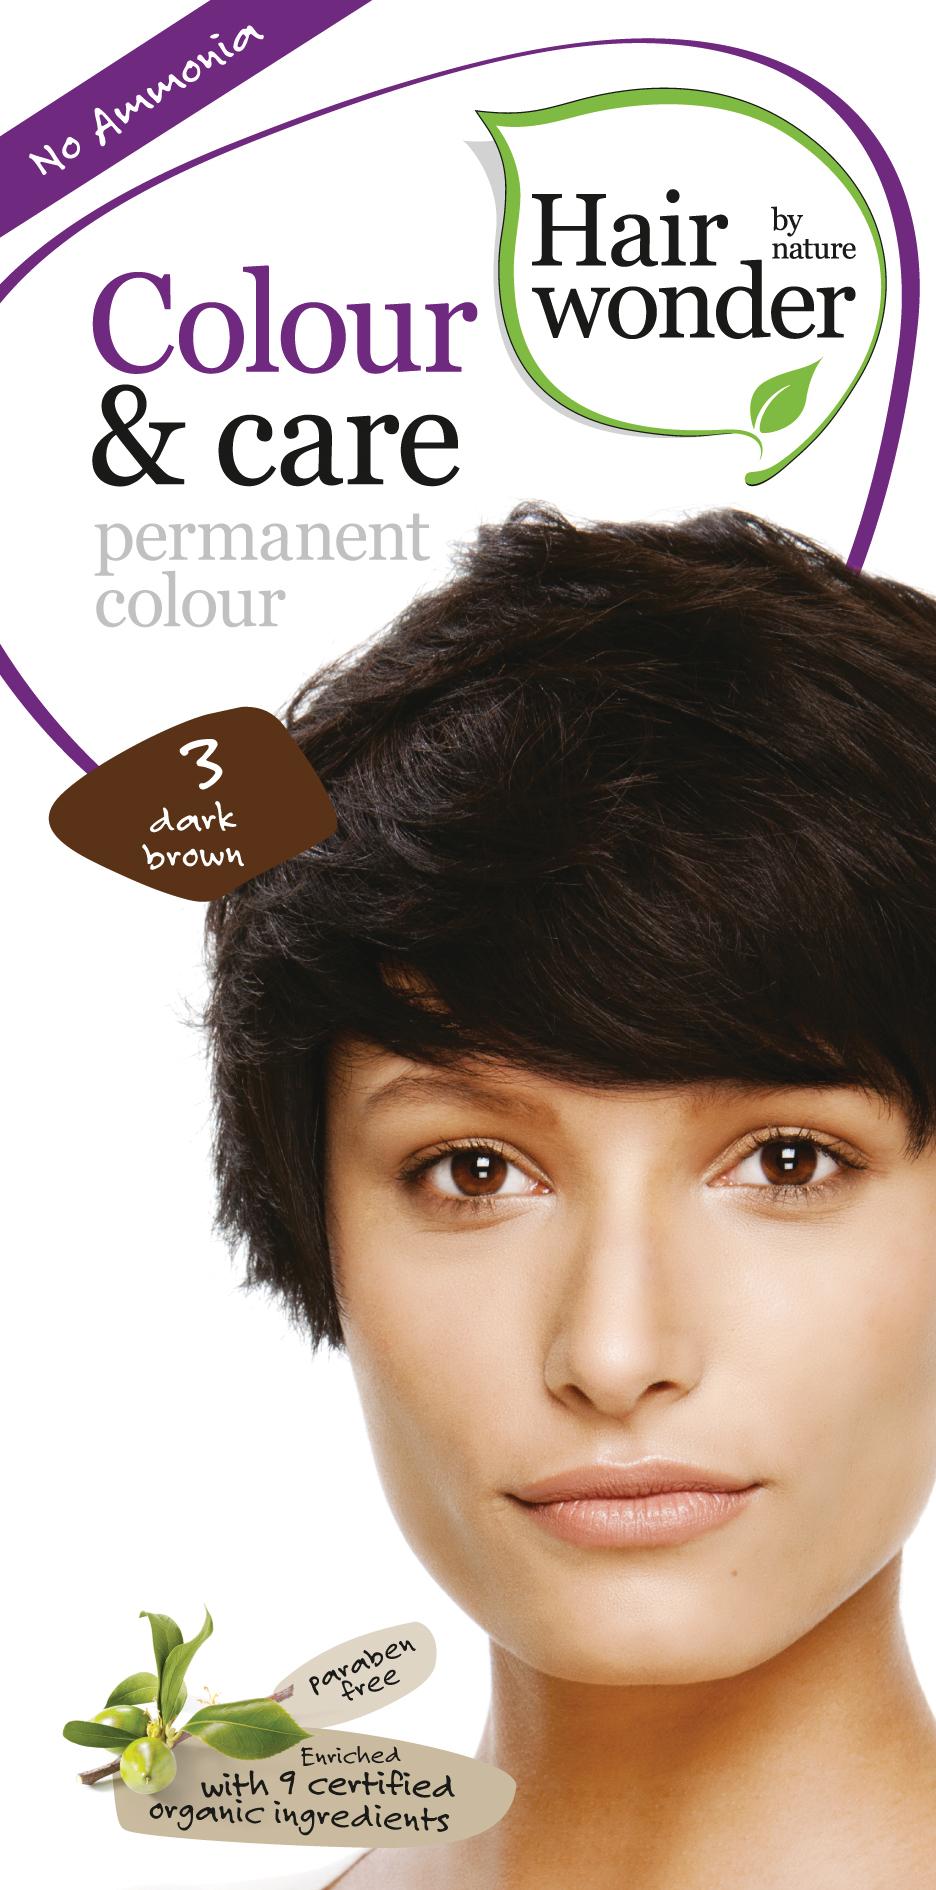 Vopsea par naturala, Colour & Care, 3 Dark Brown, Hairwonder